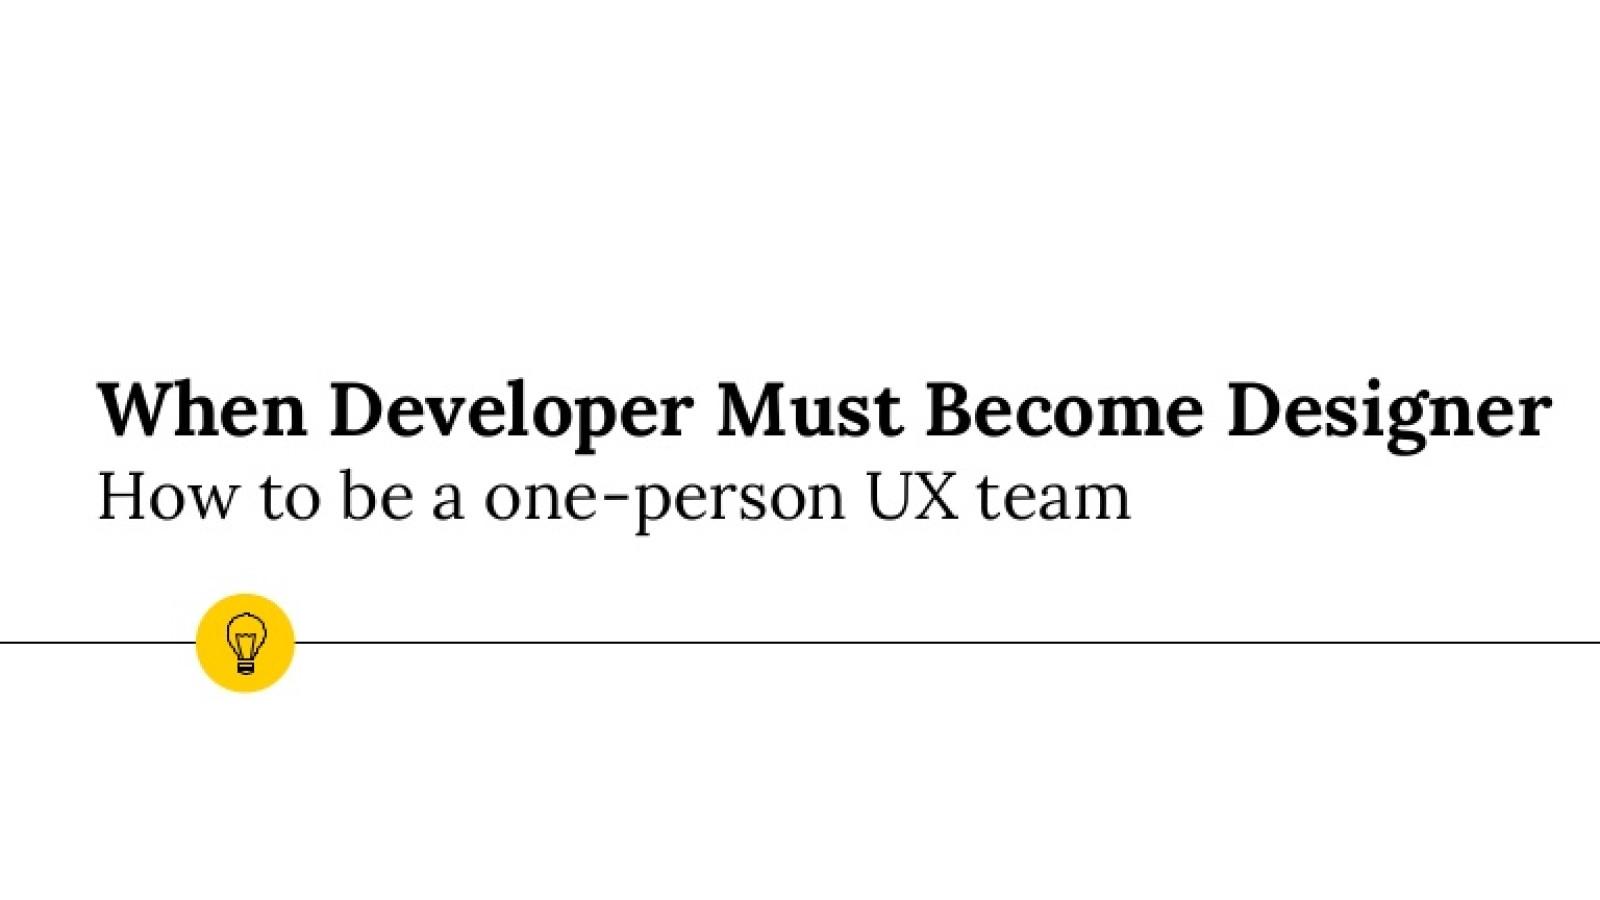 When developer must become designer